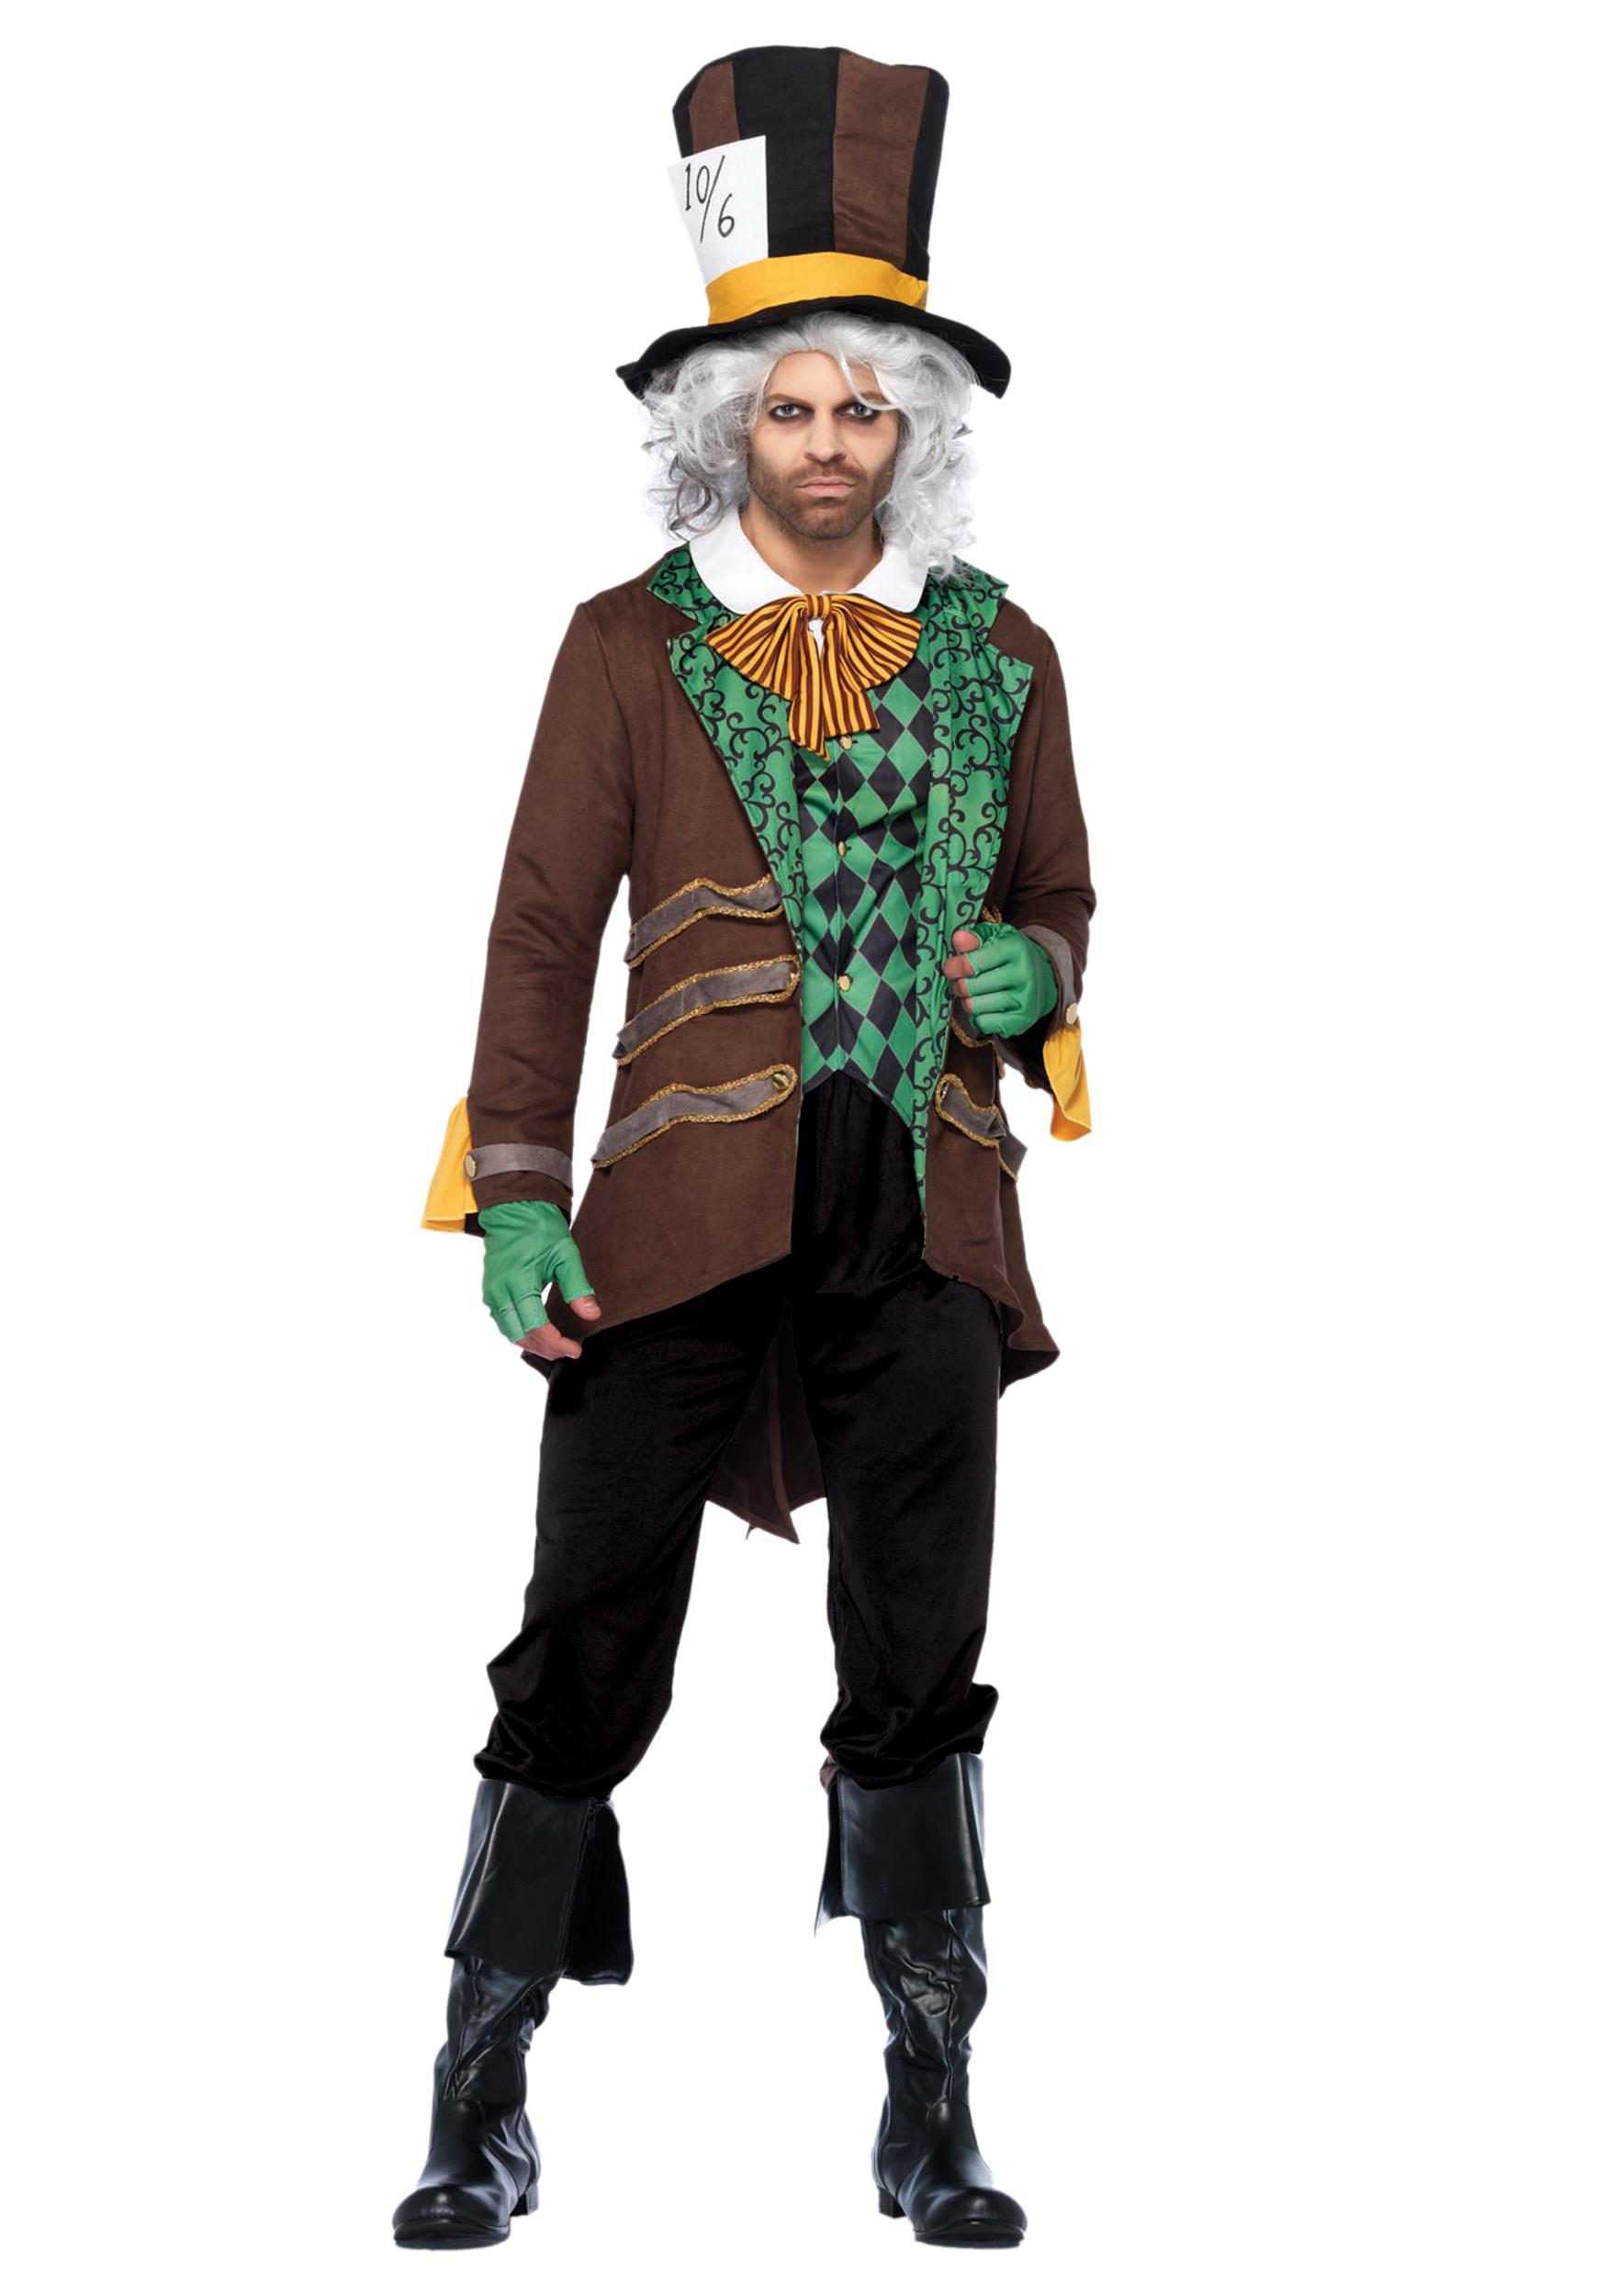 mad hatter costume - photo #22